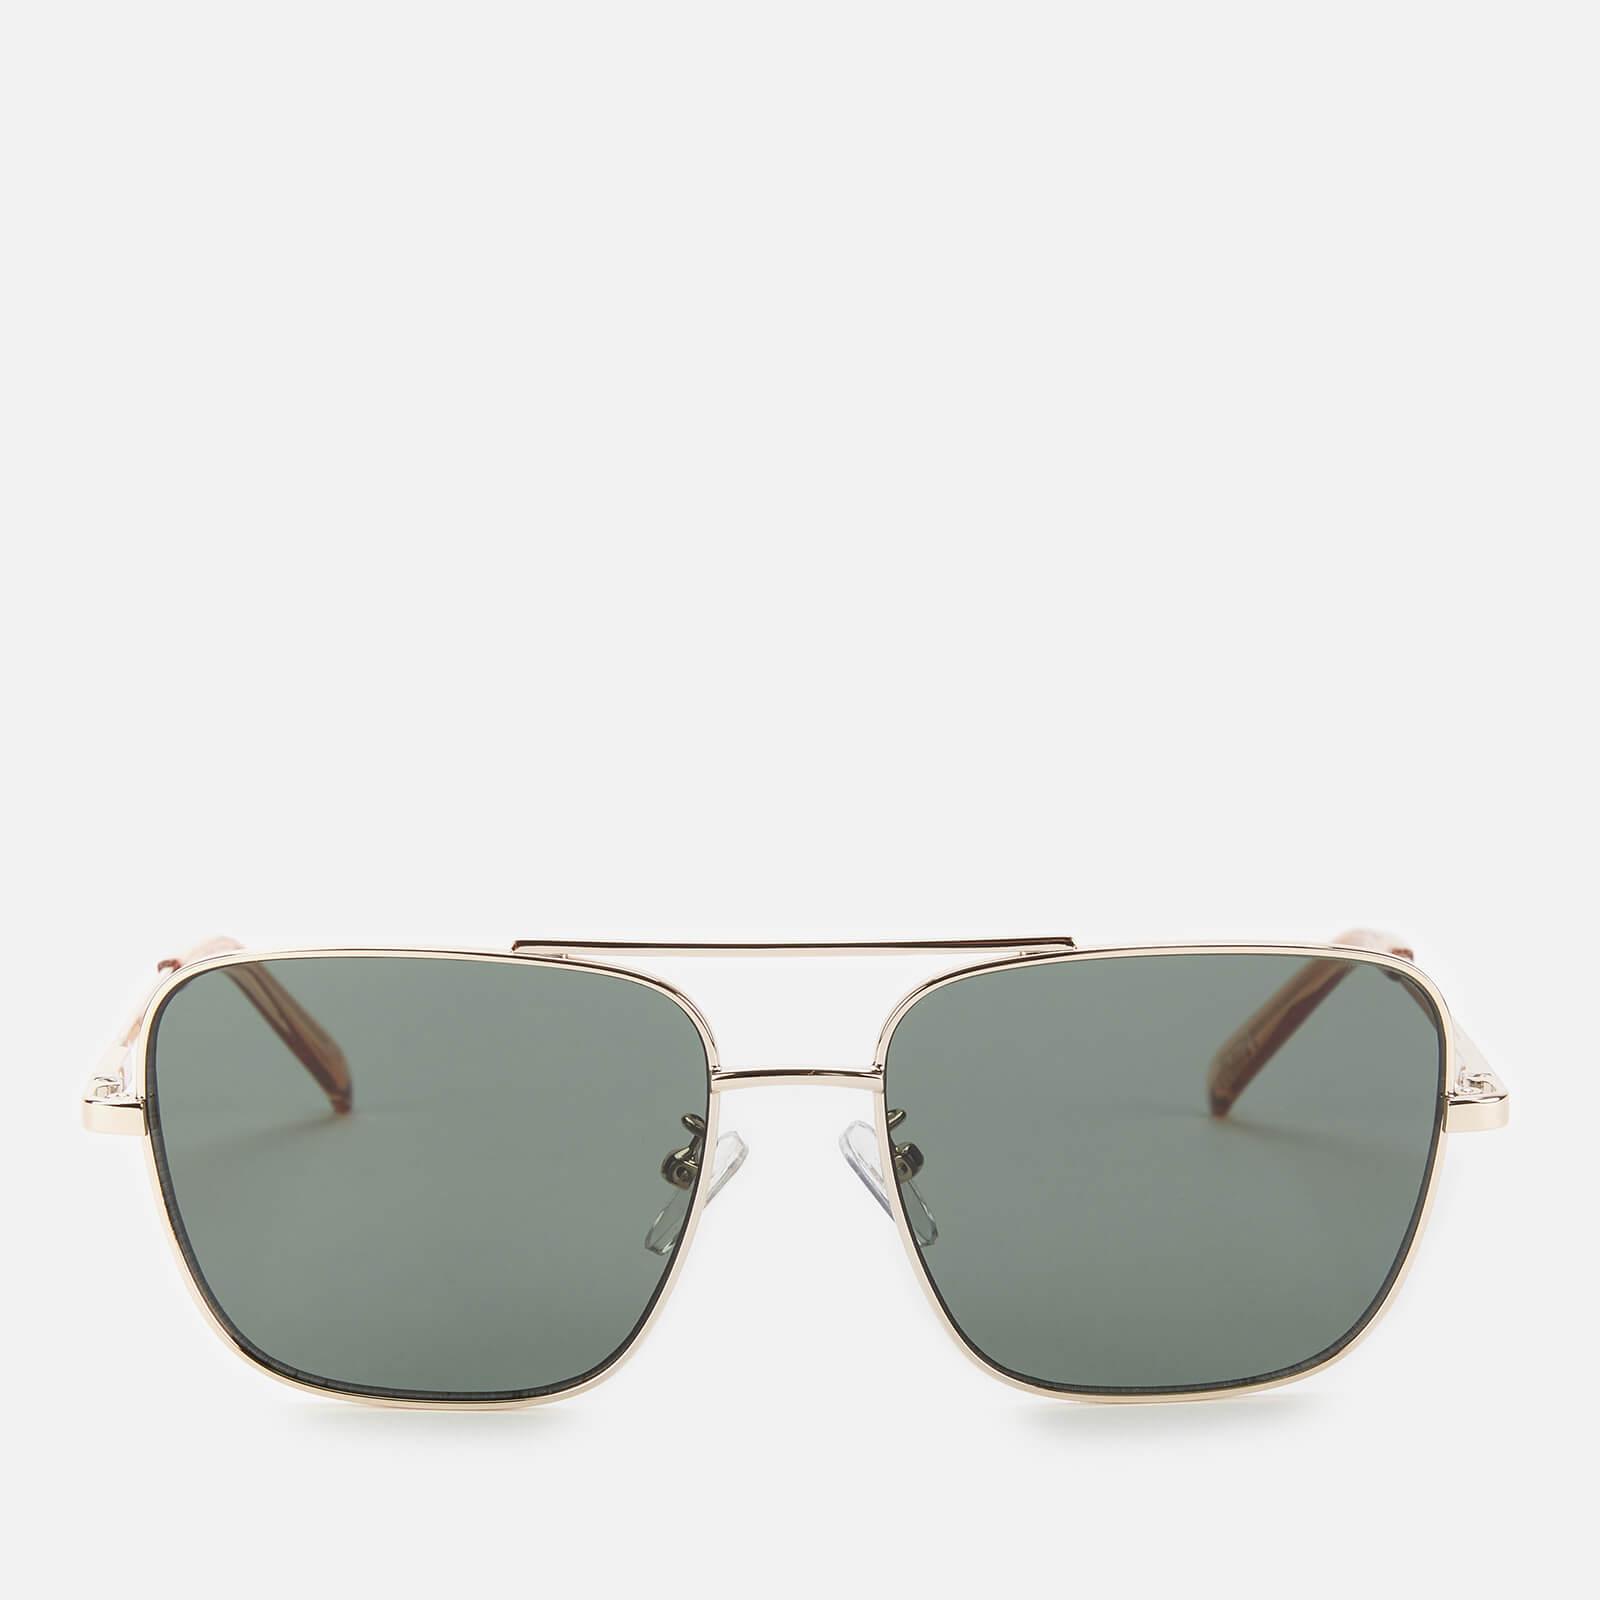 Le Specs Women's Hercules Square Sunglasses - Gold/Stone